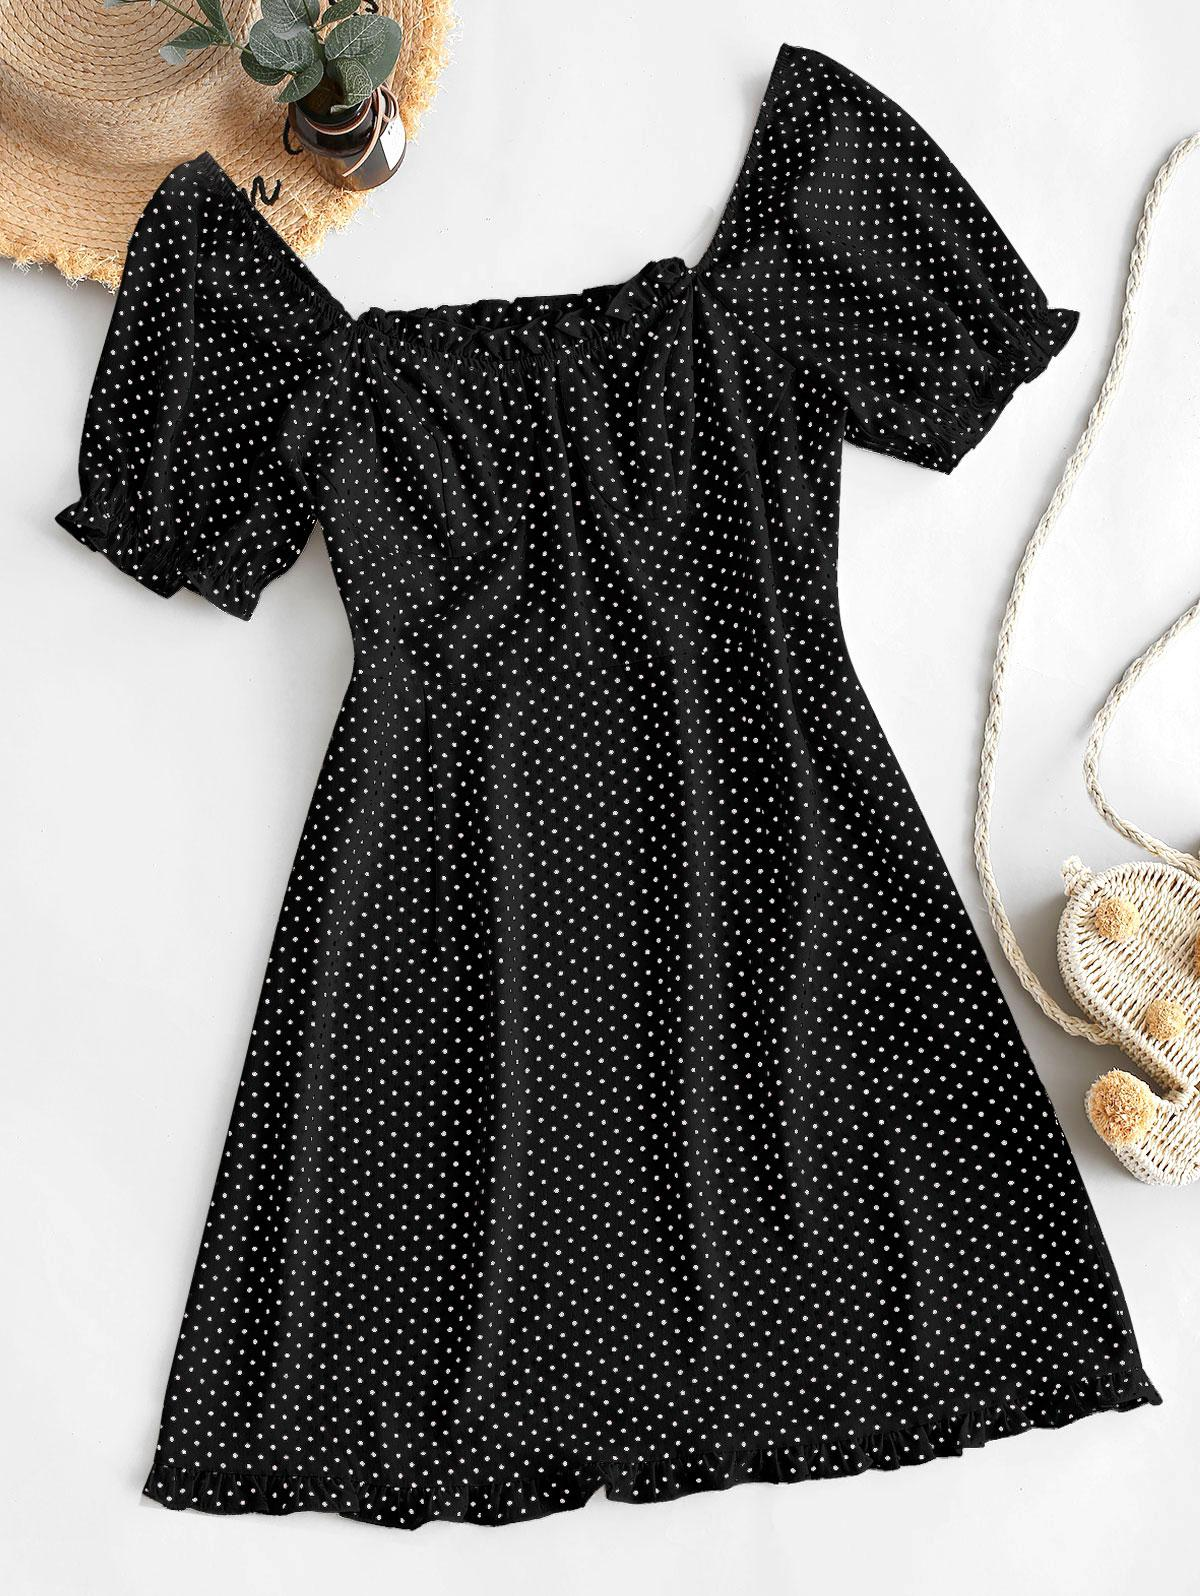 ZAFUL Polka Dot Ruffles Mini Dress